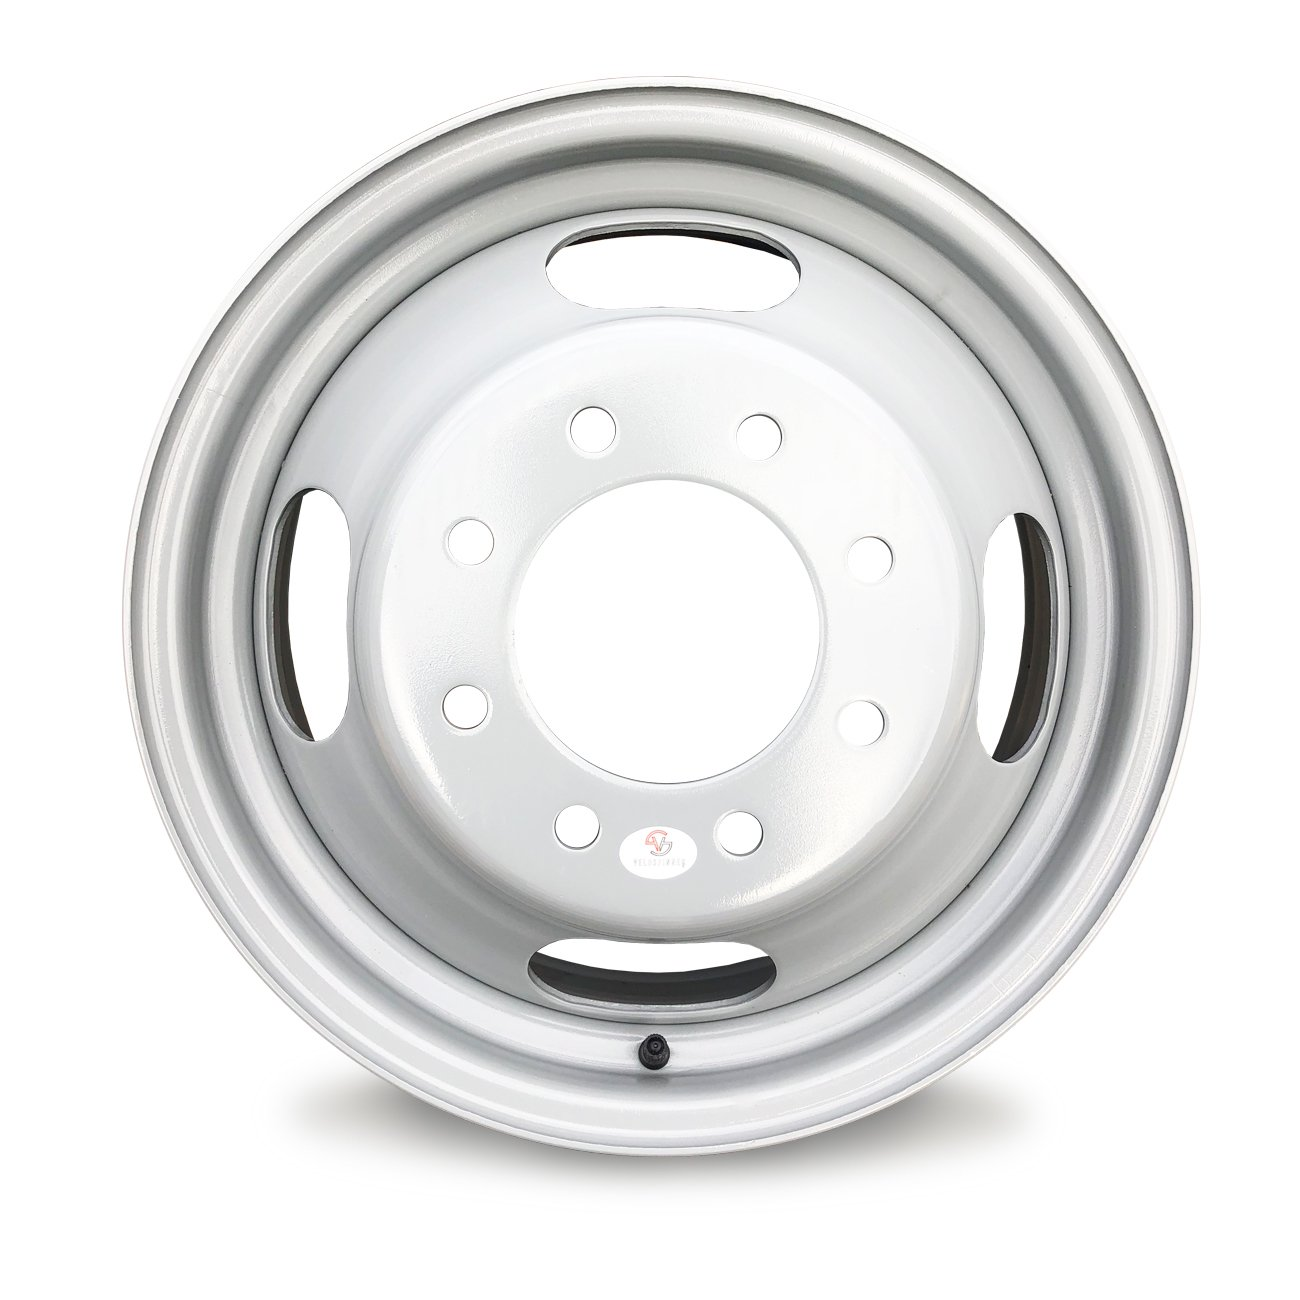 16X6.5'' GMC 03-15 Savana 3500 Super Duty Dually Steel Wheel Rim OEM Quality 5125